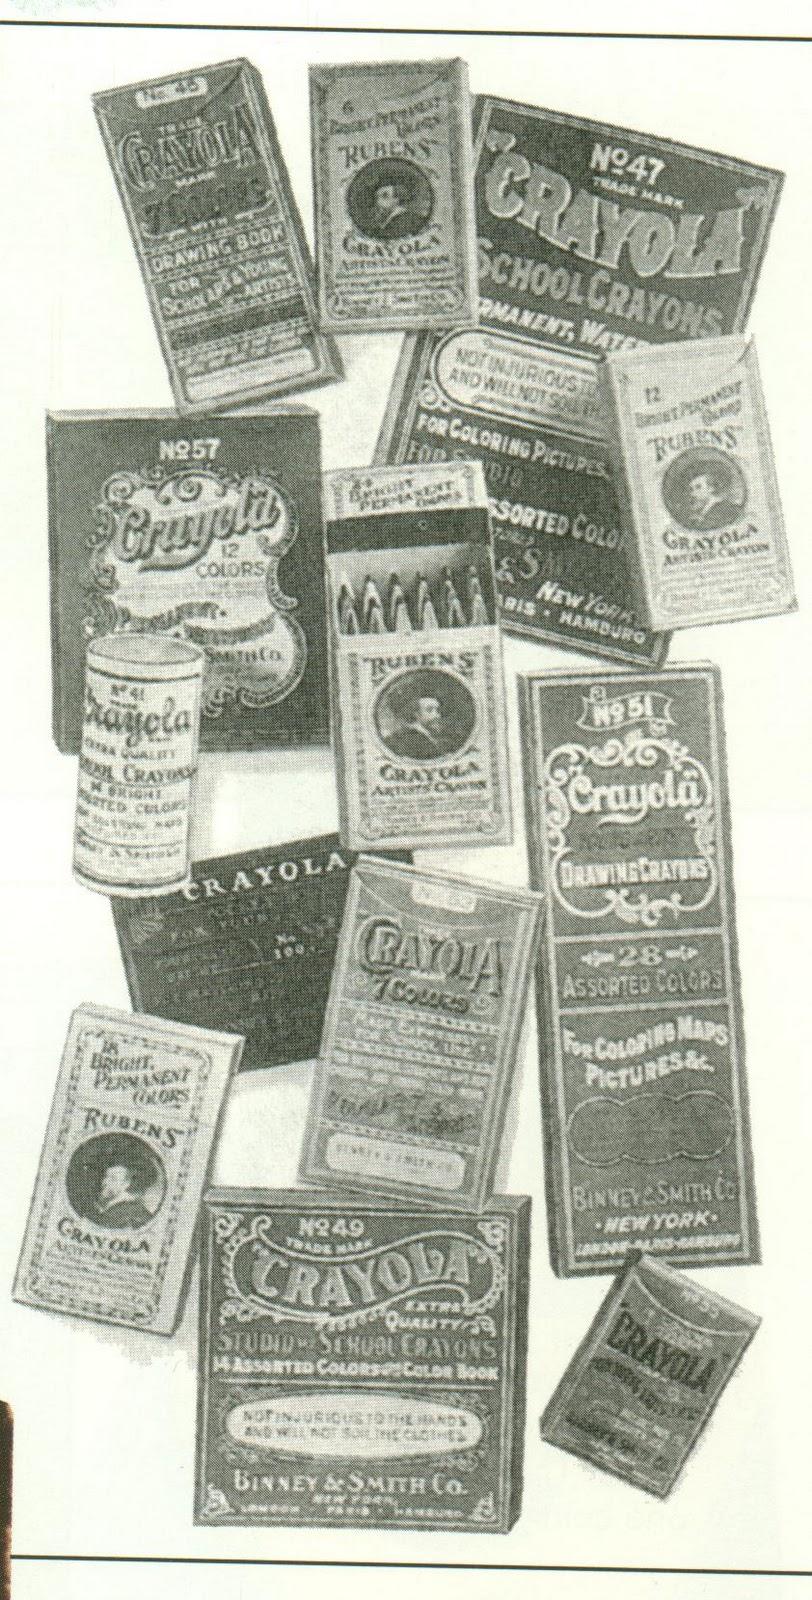 The Crayon Blog: The Crayola No 100 Box